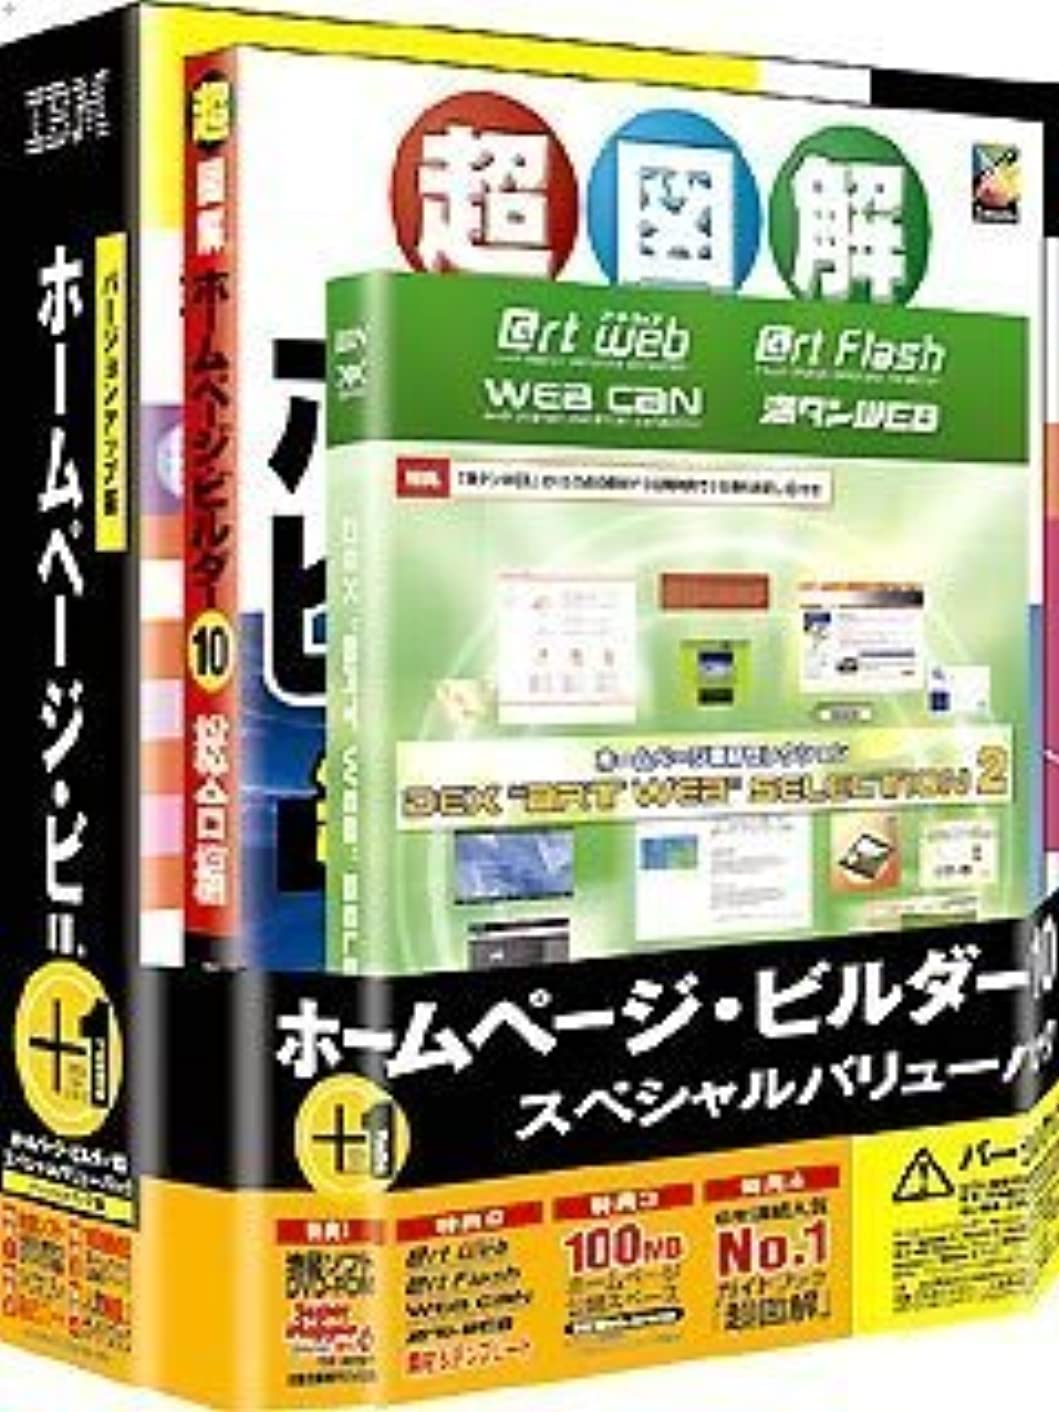 IBMホームページ?ビルダー10 スペシャルバリューパック バージョンアップ版